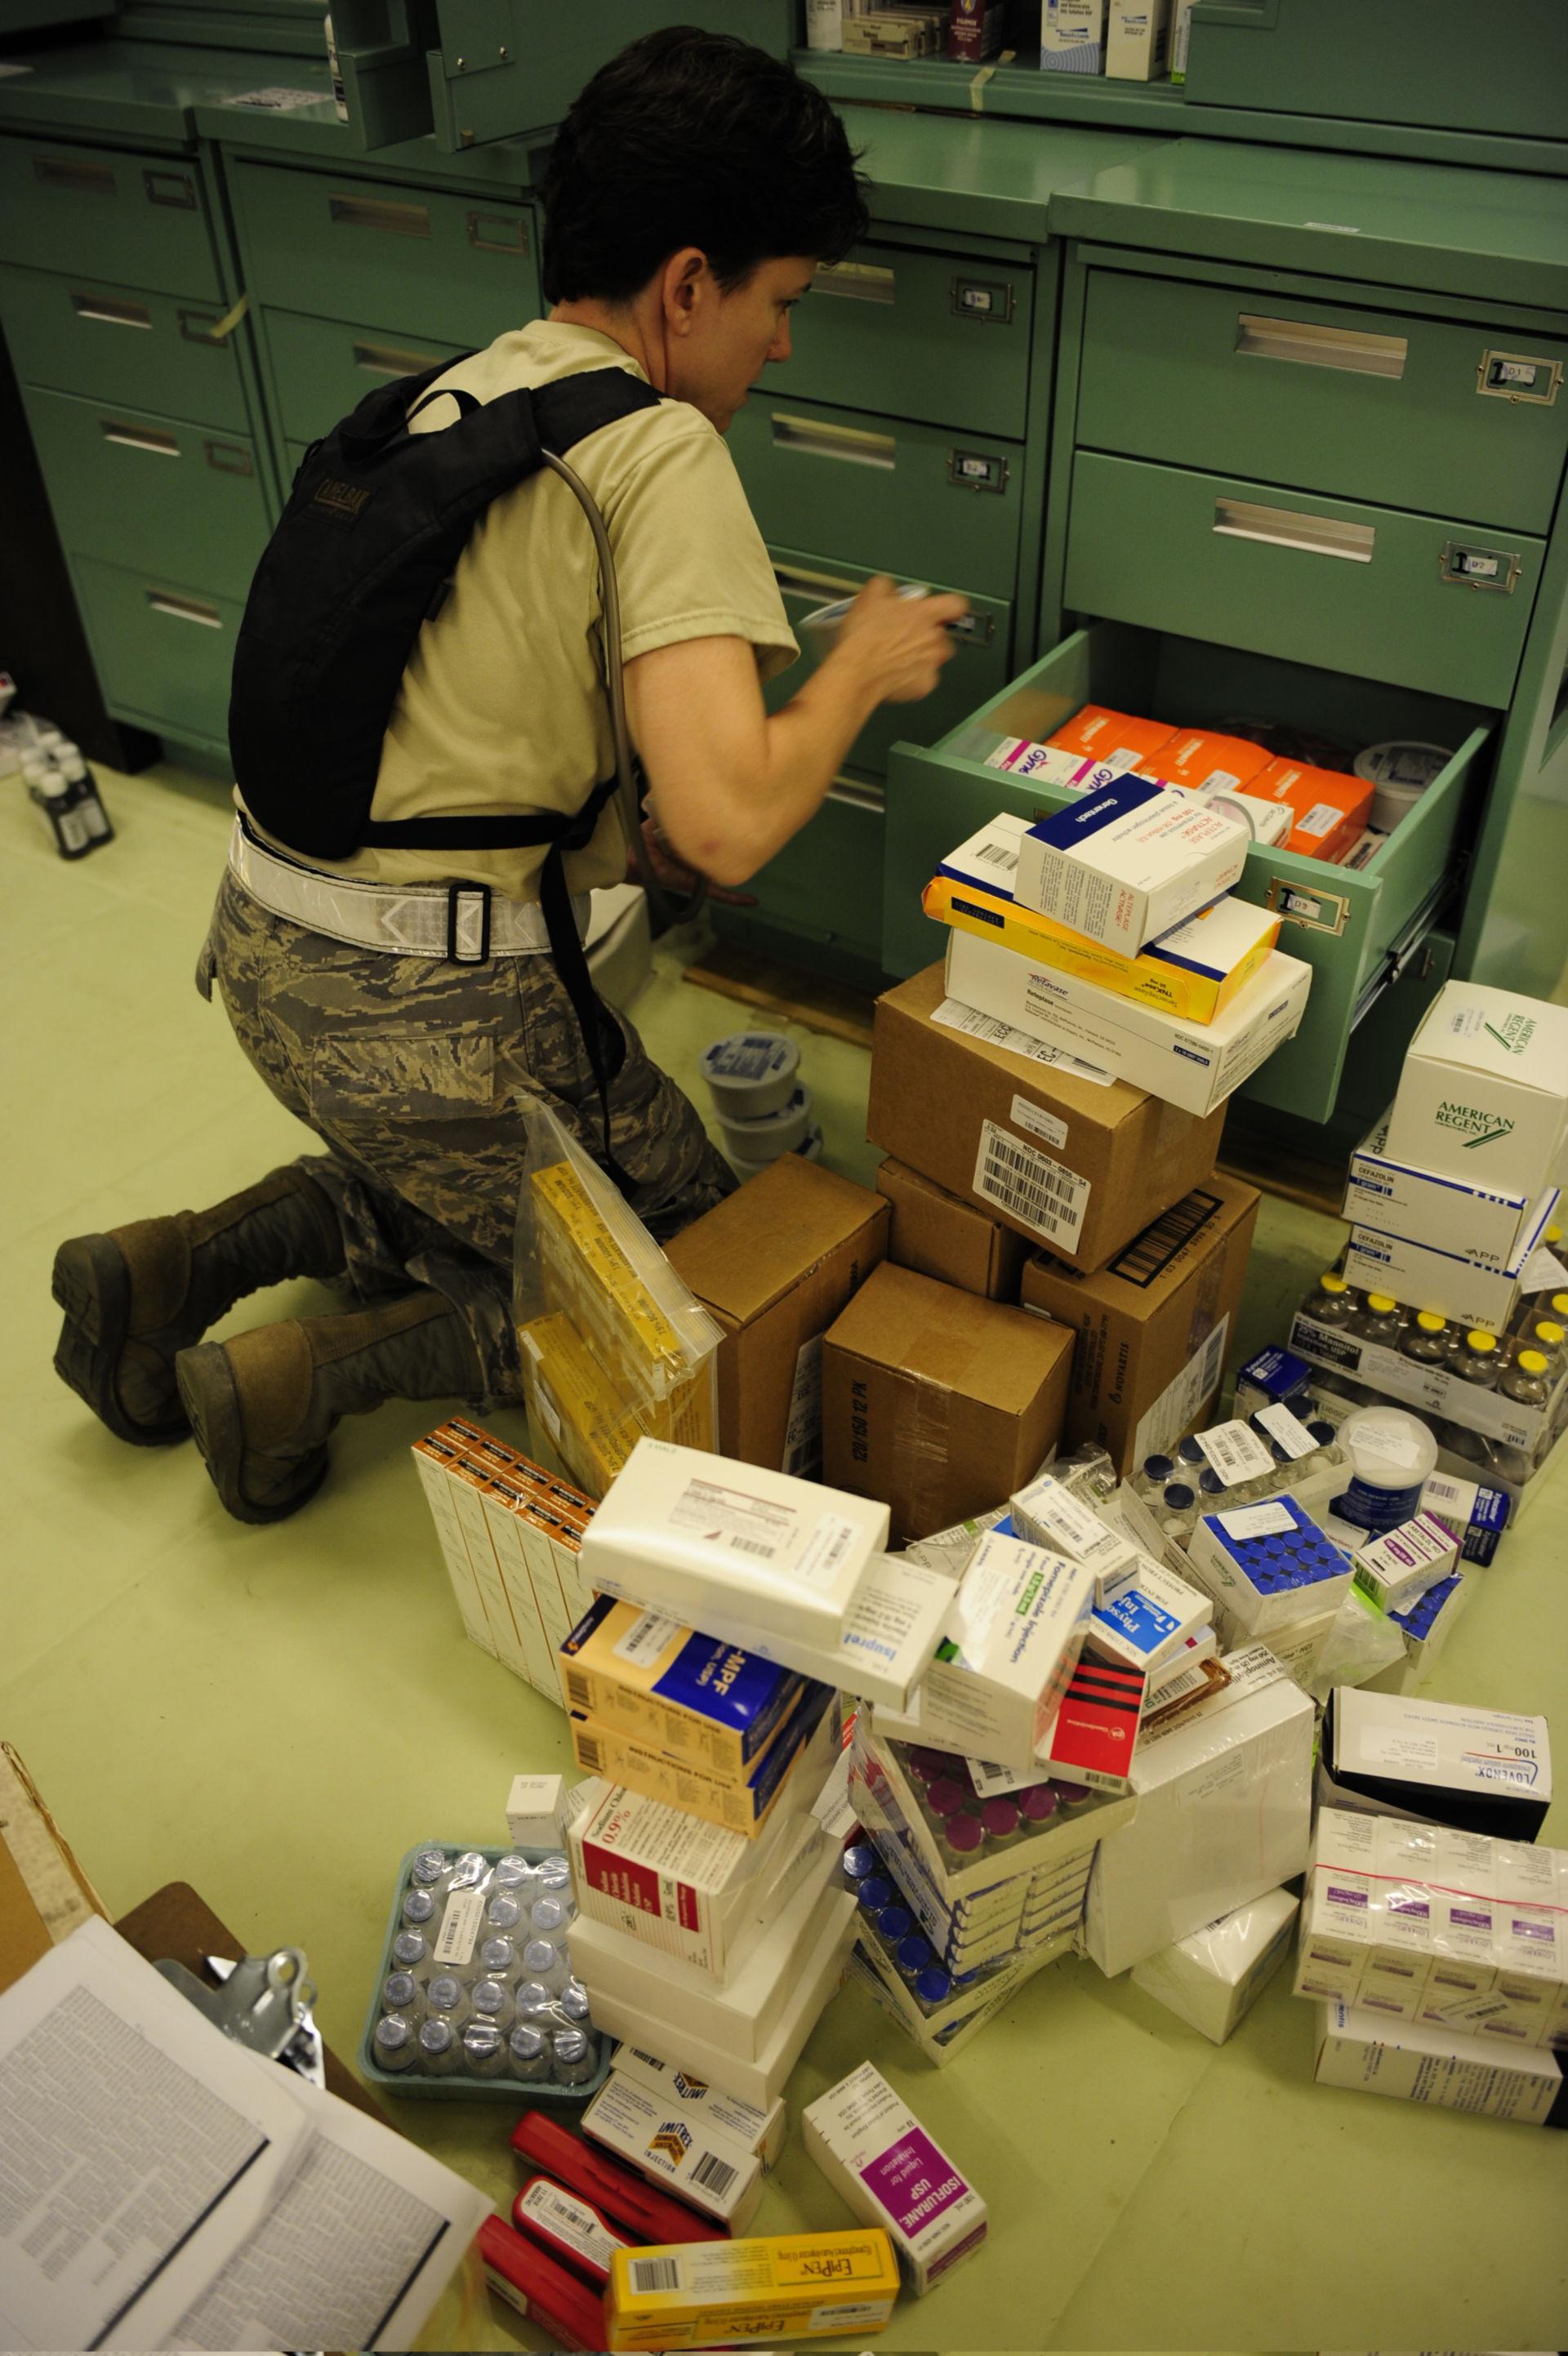 Medicina e droghe per noi forze in Afghanistan (2010)